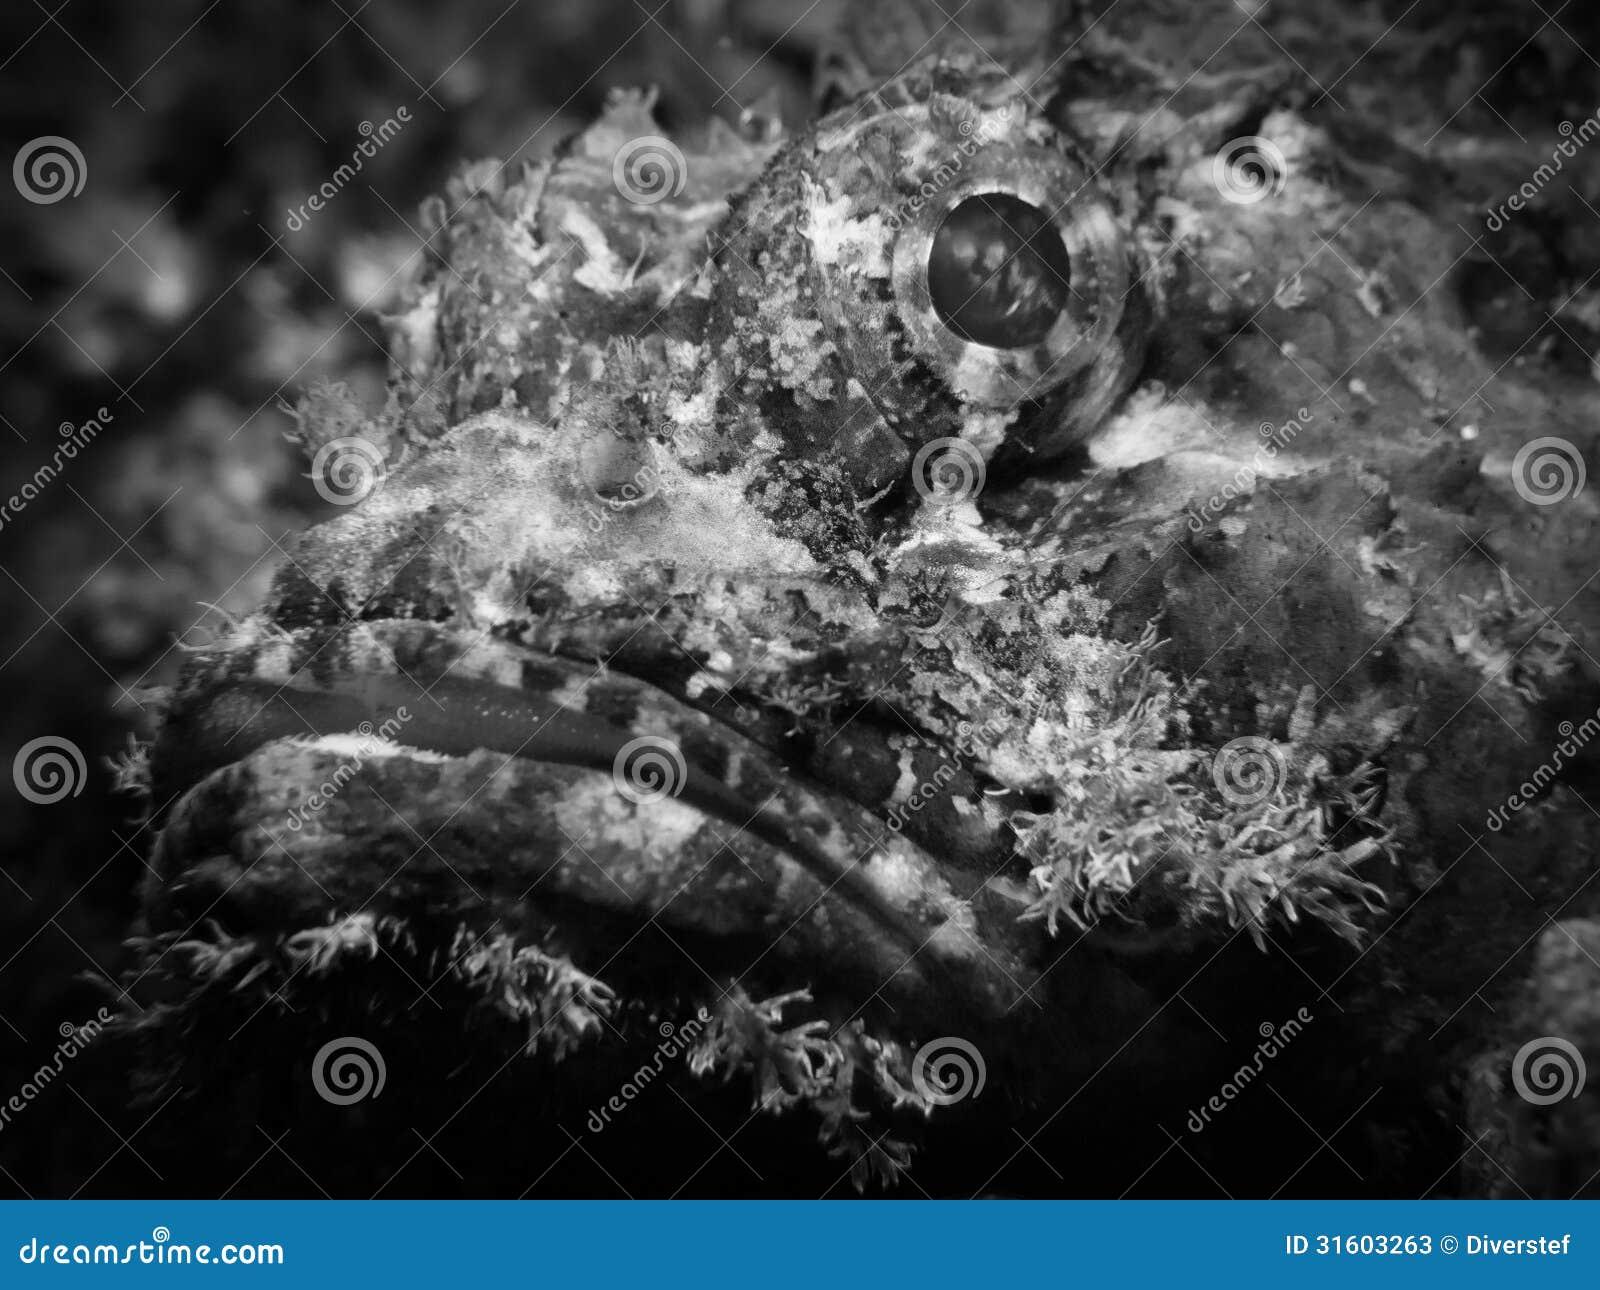 Raggy Scorpianfish, Scorpaenopsis venosa -